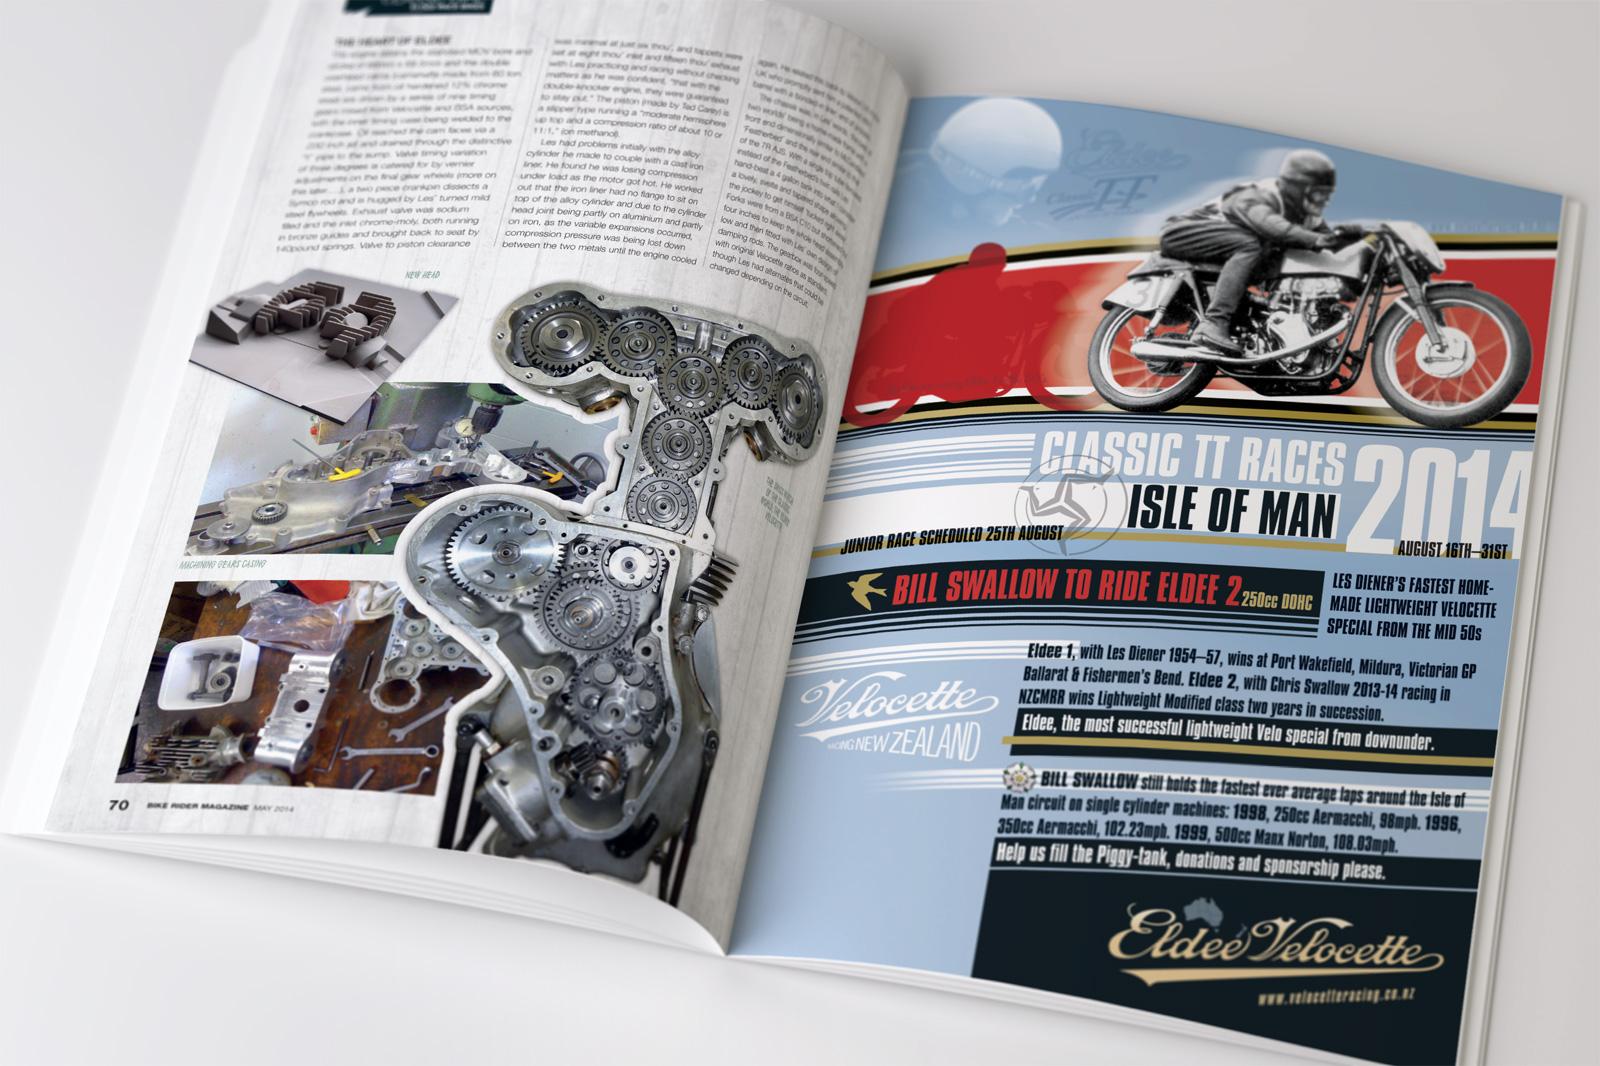 BRNZ Eldee-2 Isle of Man Classic TT races full page advertisement